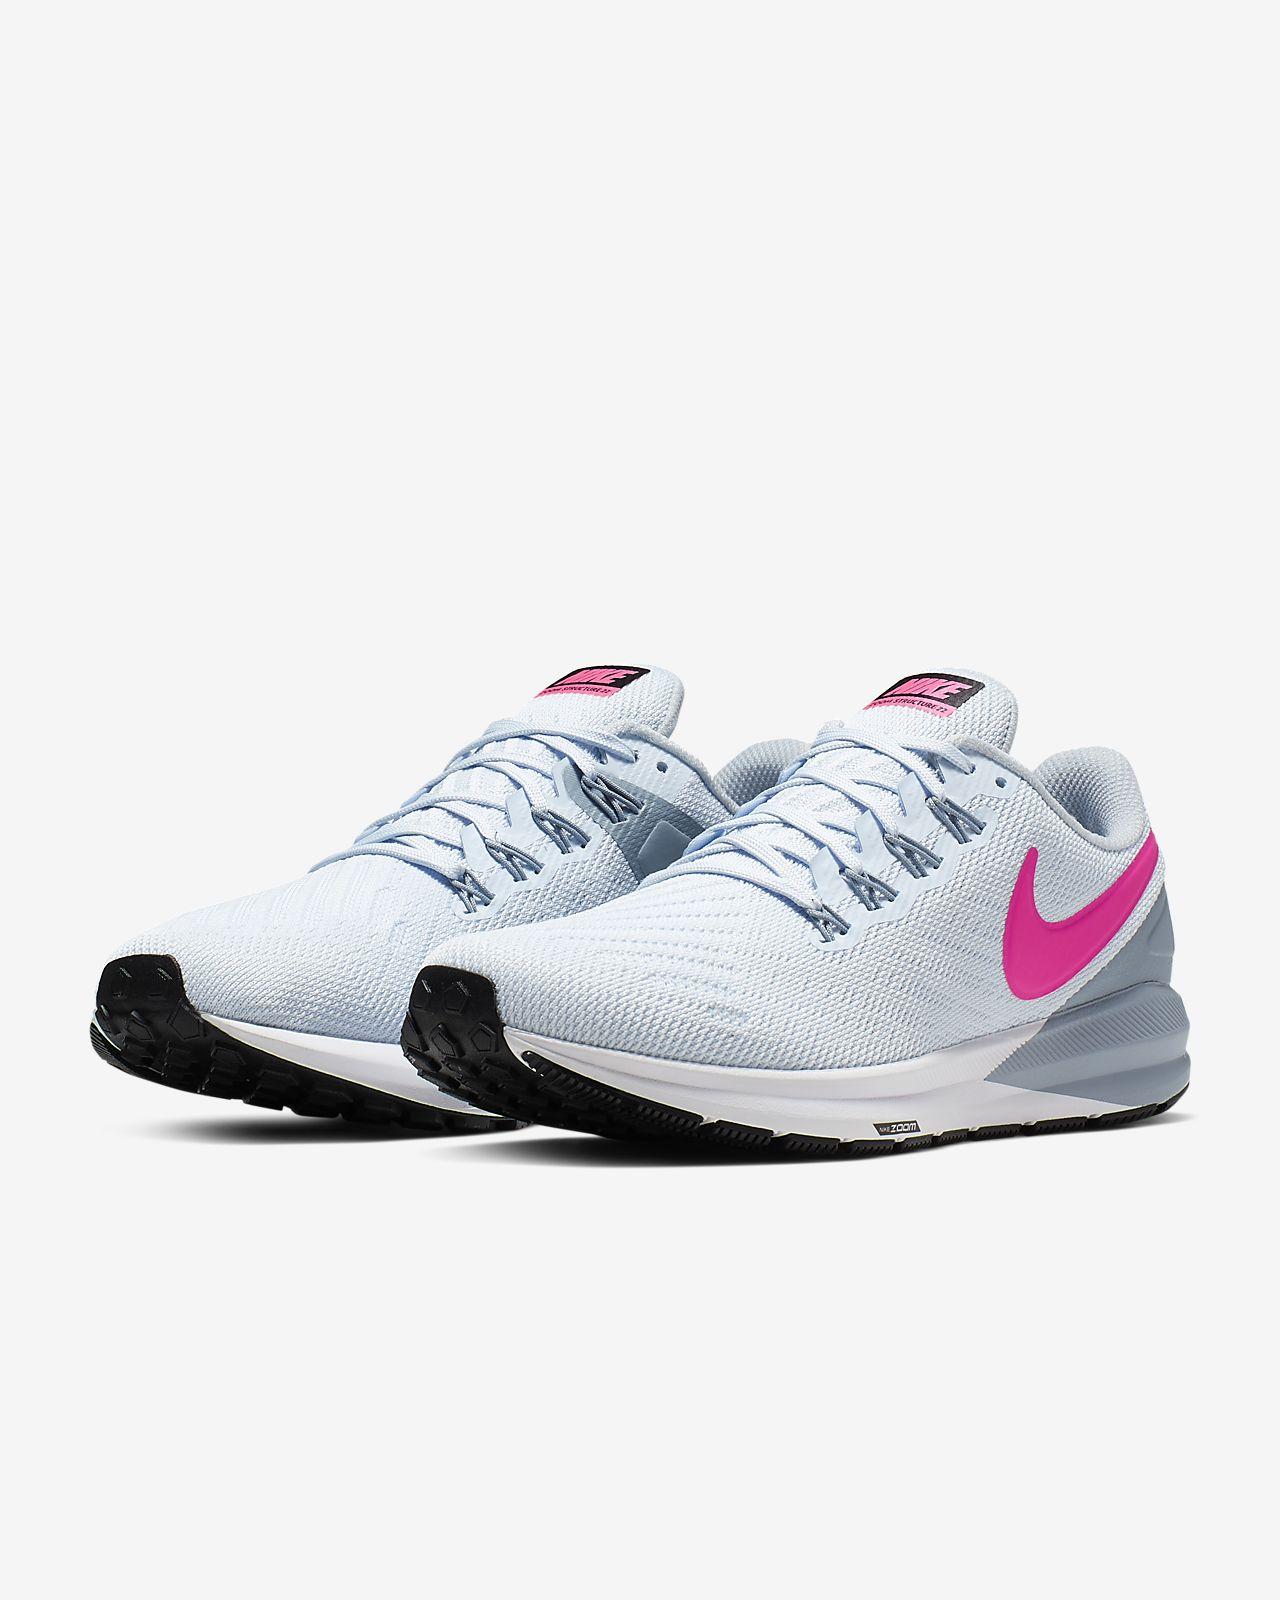 buy online 3b08a 55e98 ... Nike Air Zoom Structure 22 Women s Running Shoe